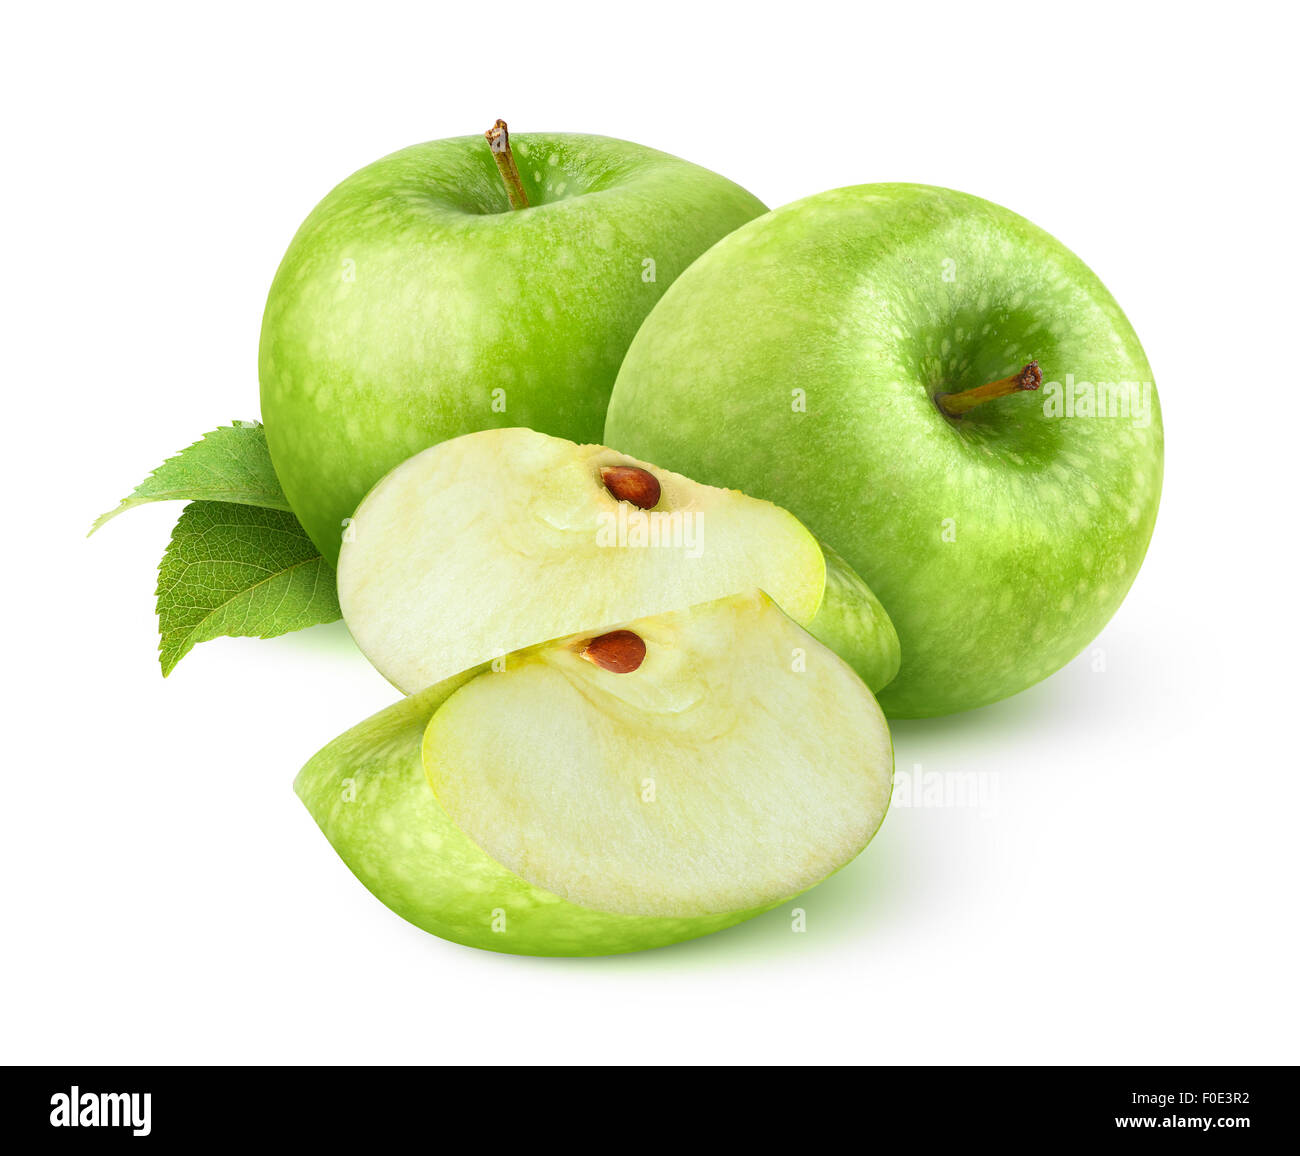 La pomme verte isolated on white Photo Stock